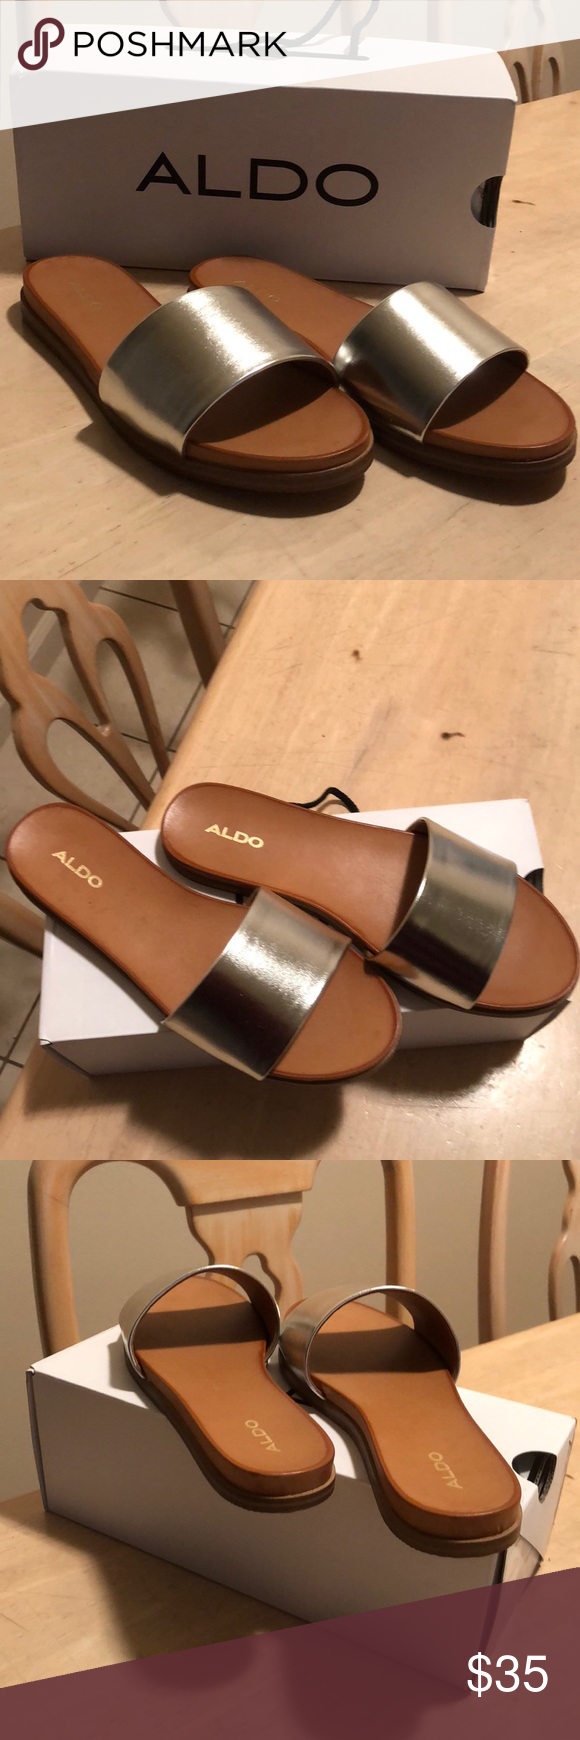 3f6d9c3fe0d2 Aldo Fabrizzia-u slide sandals New